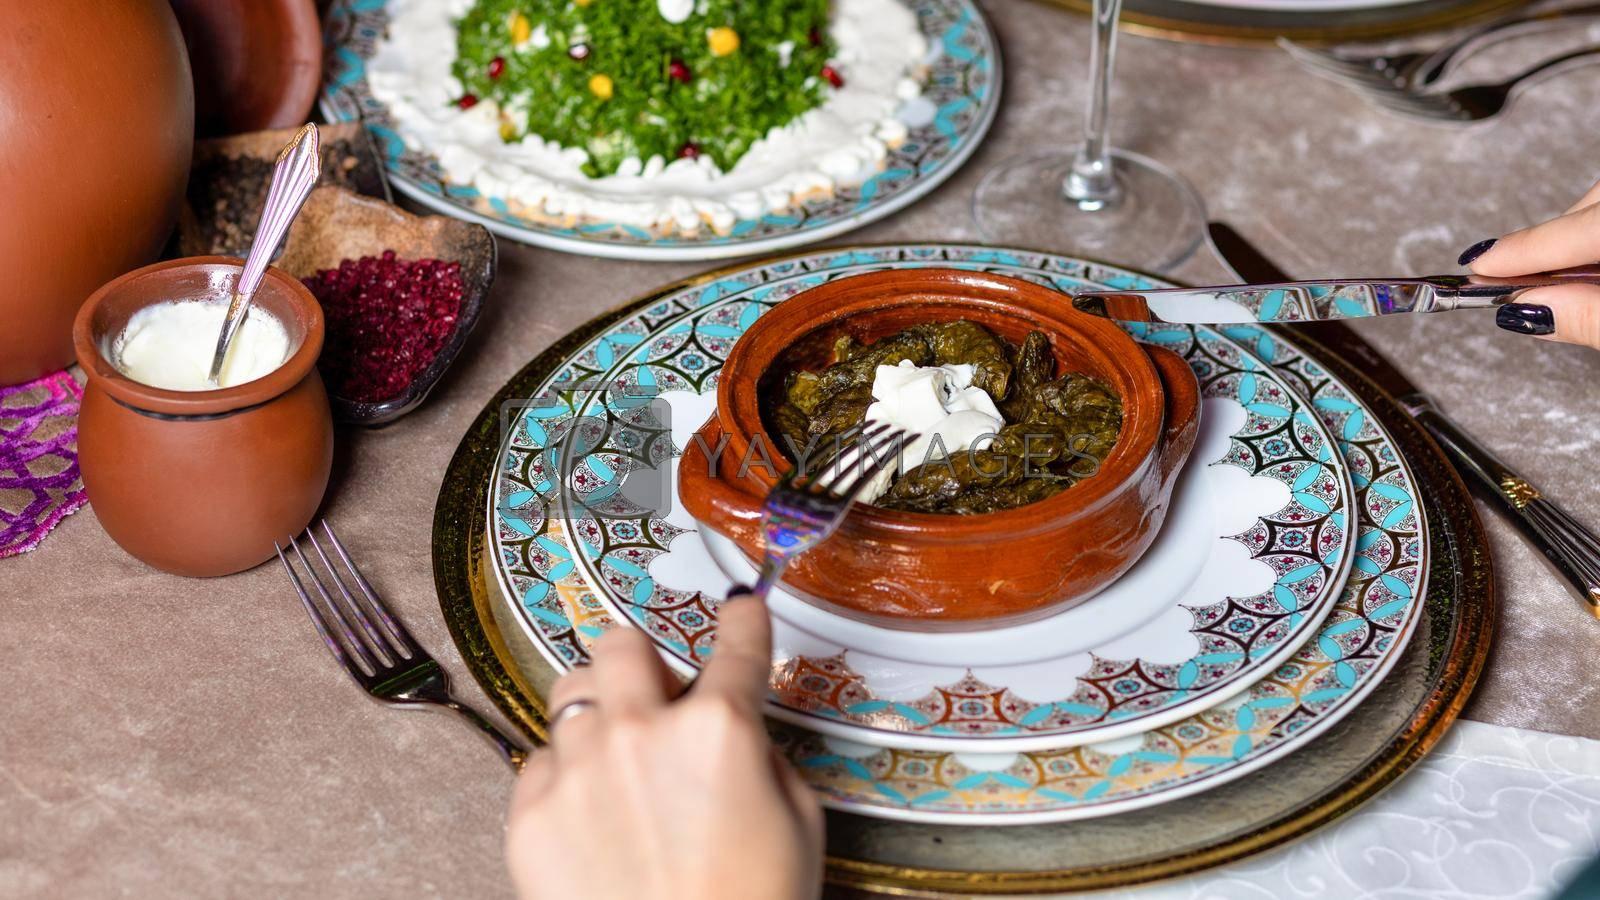 Woman eating Dolma, Azerbaijani meal top view